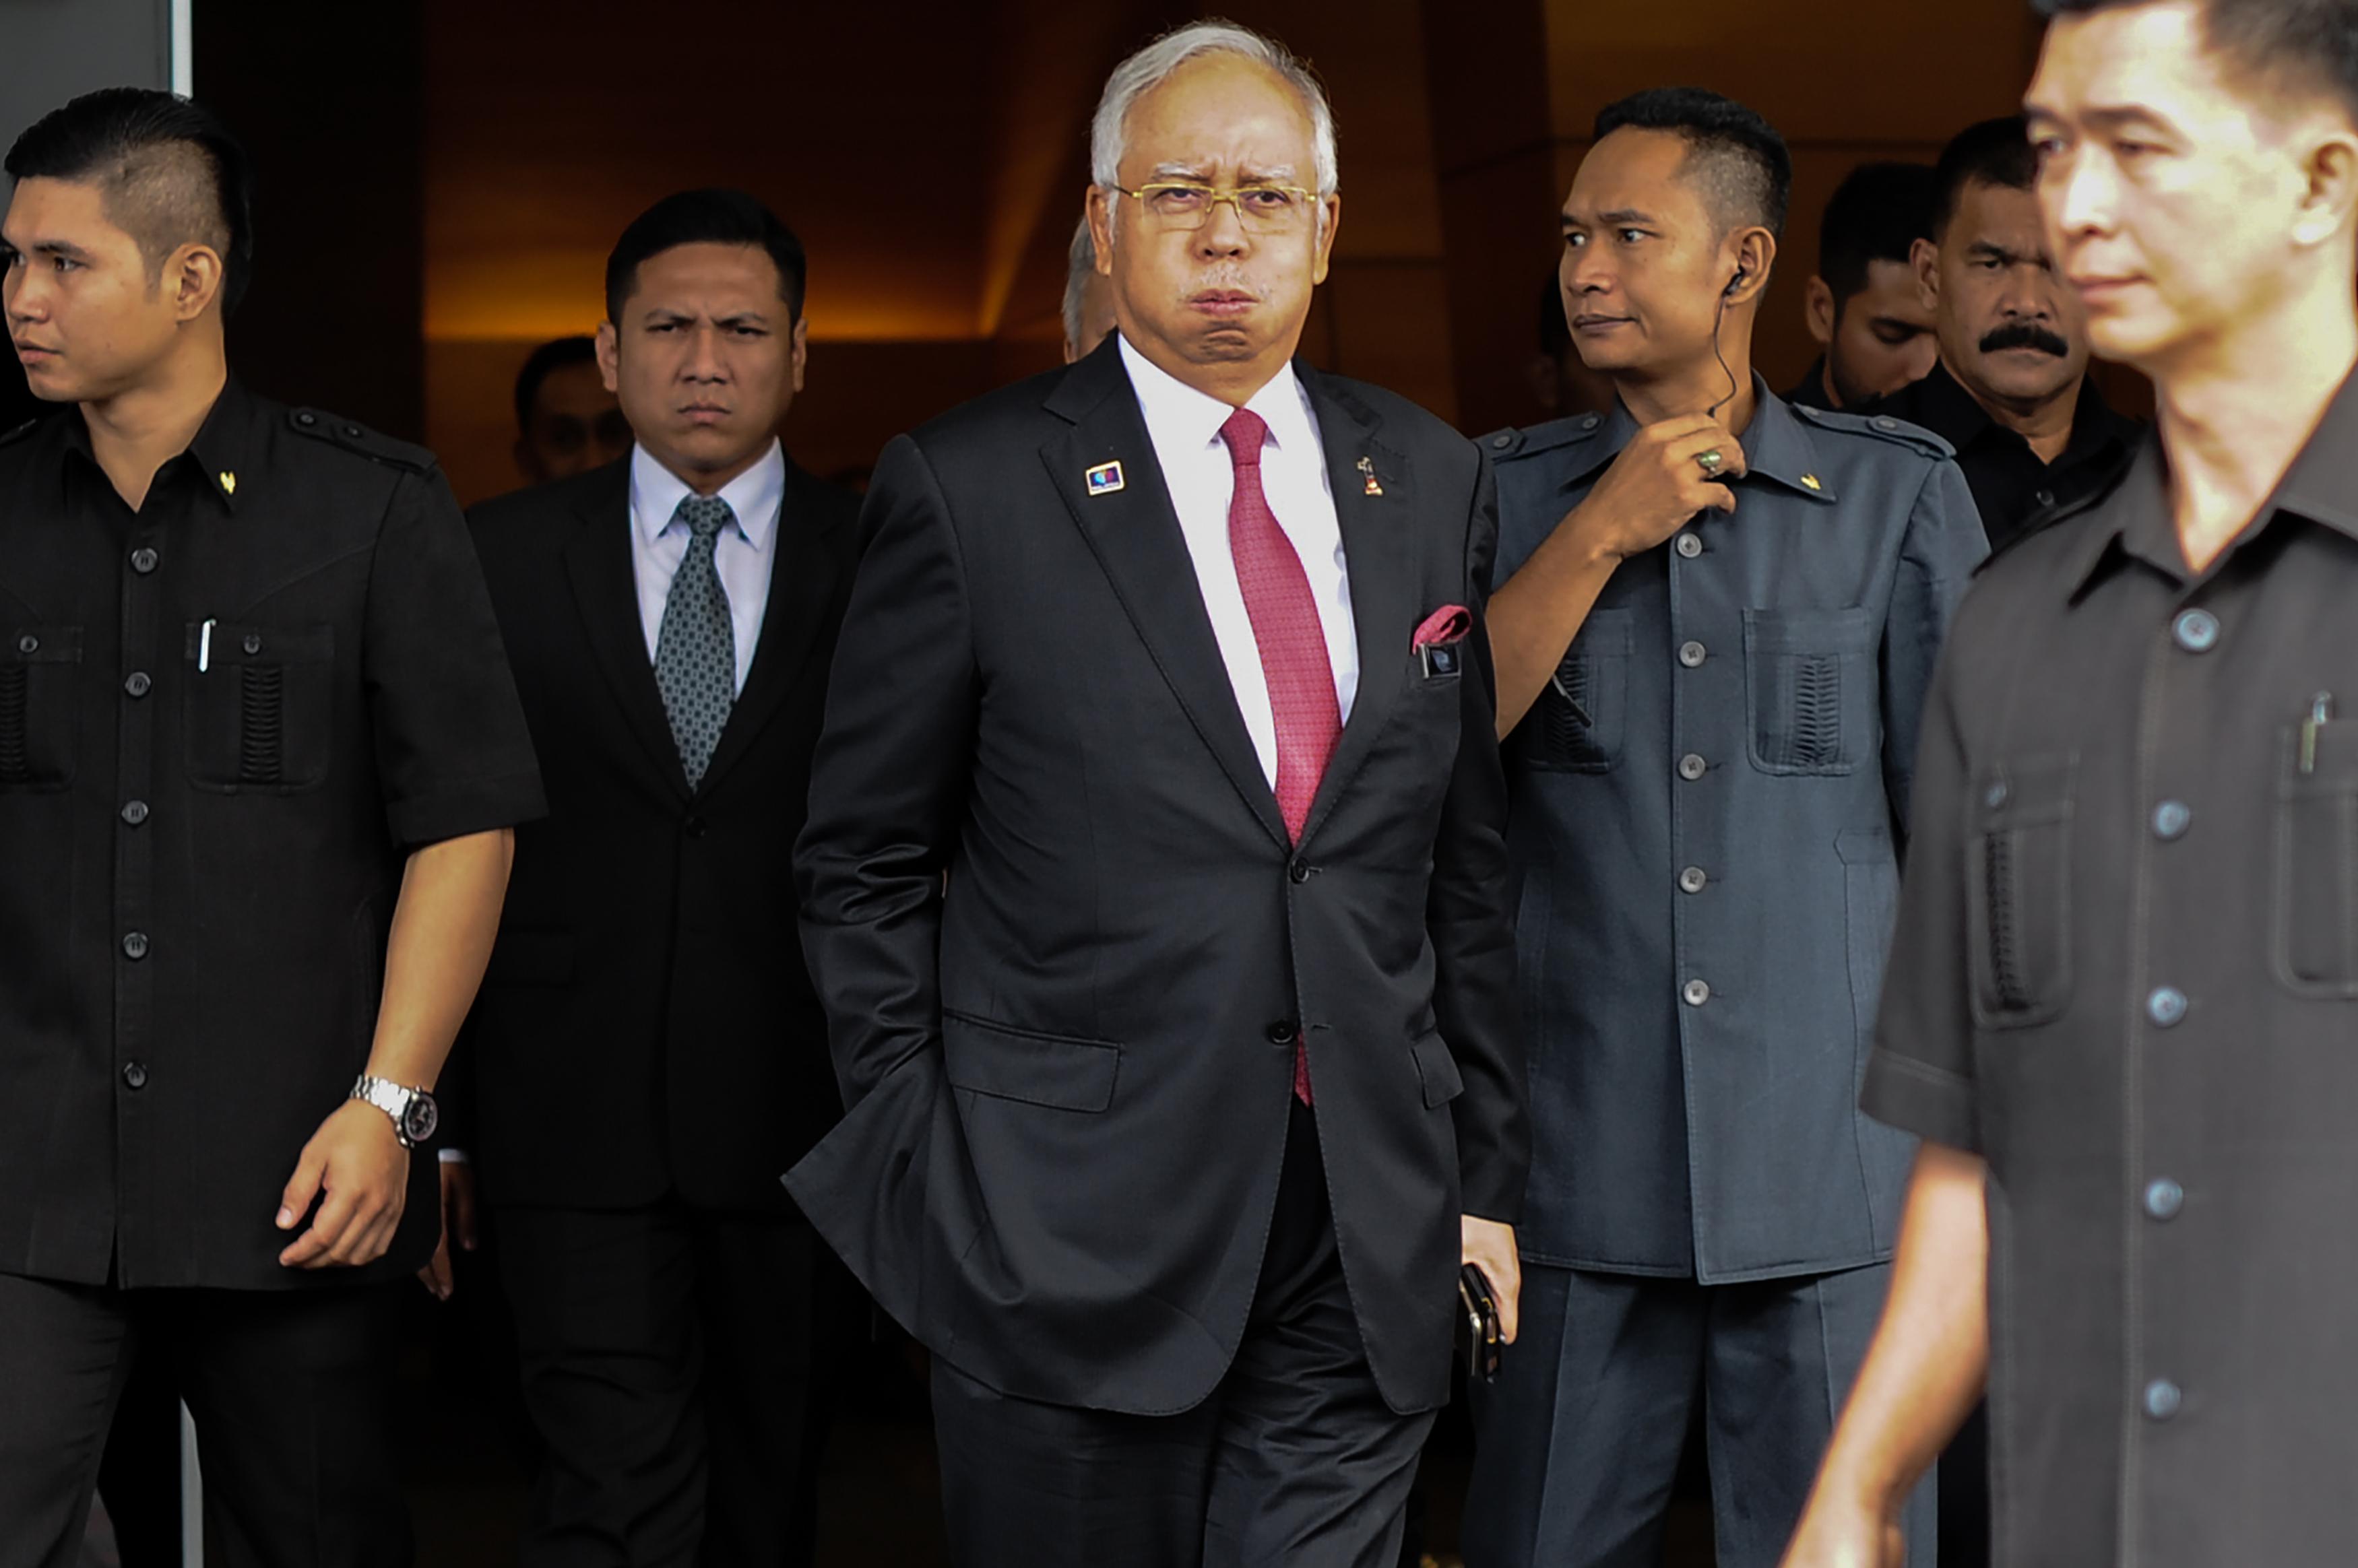 MALAYSIA-POLITICS-CORRUPTION-SAUDI